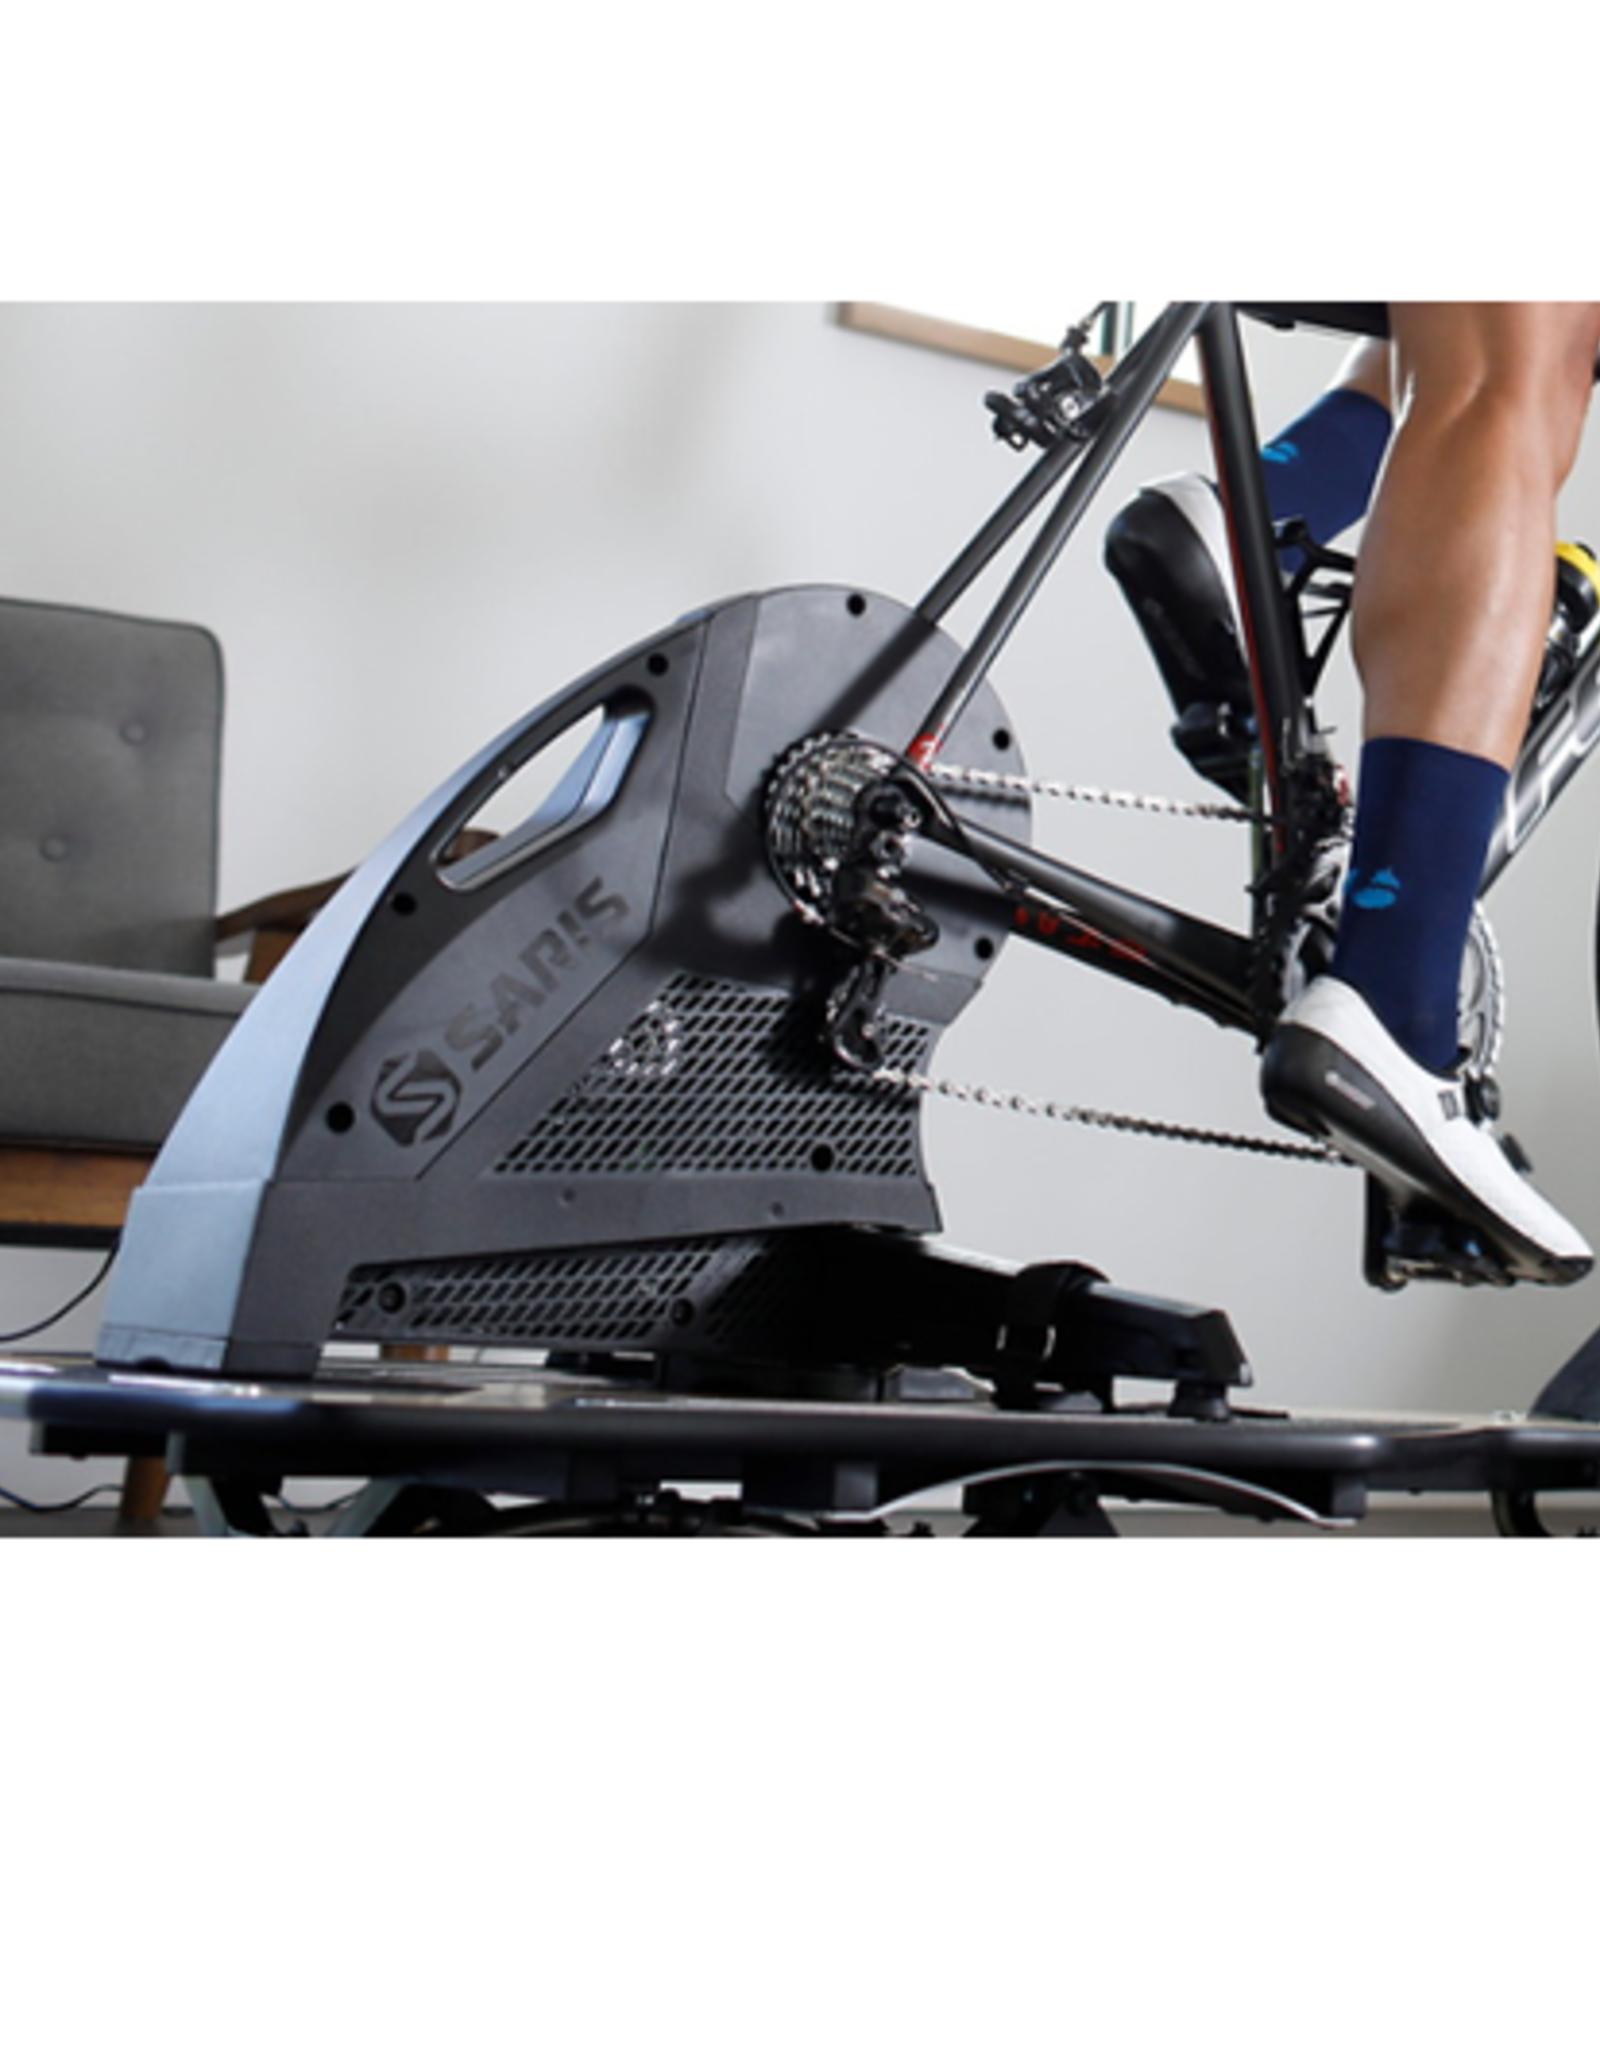 Trainer - Saris H3 Direct Drive Smart Trainer